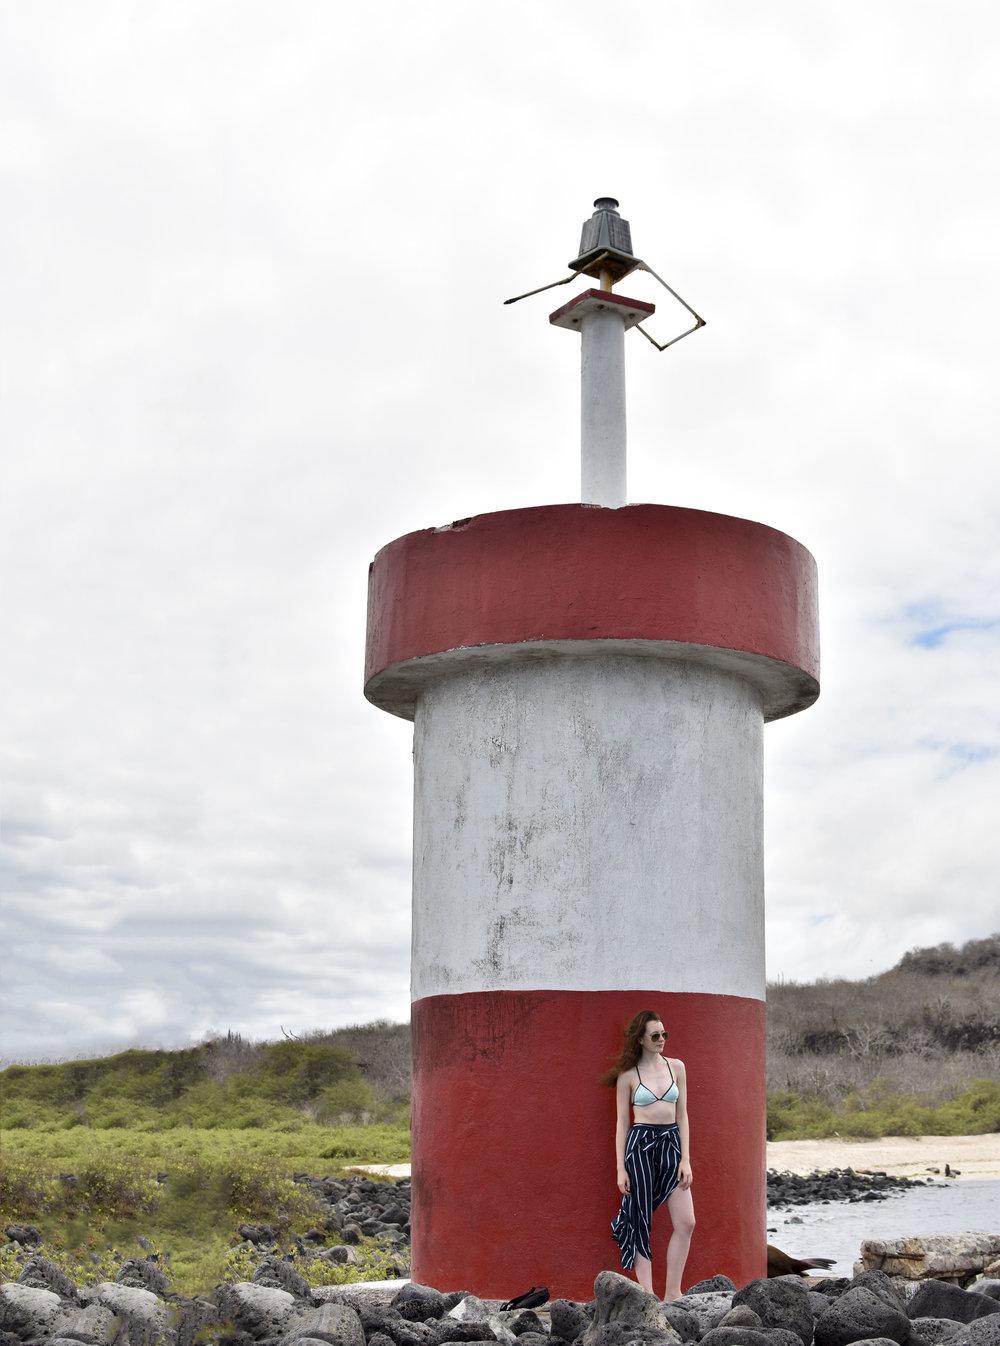 San Cristobal Galapagos day 2 edited 2.jpg